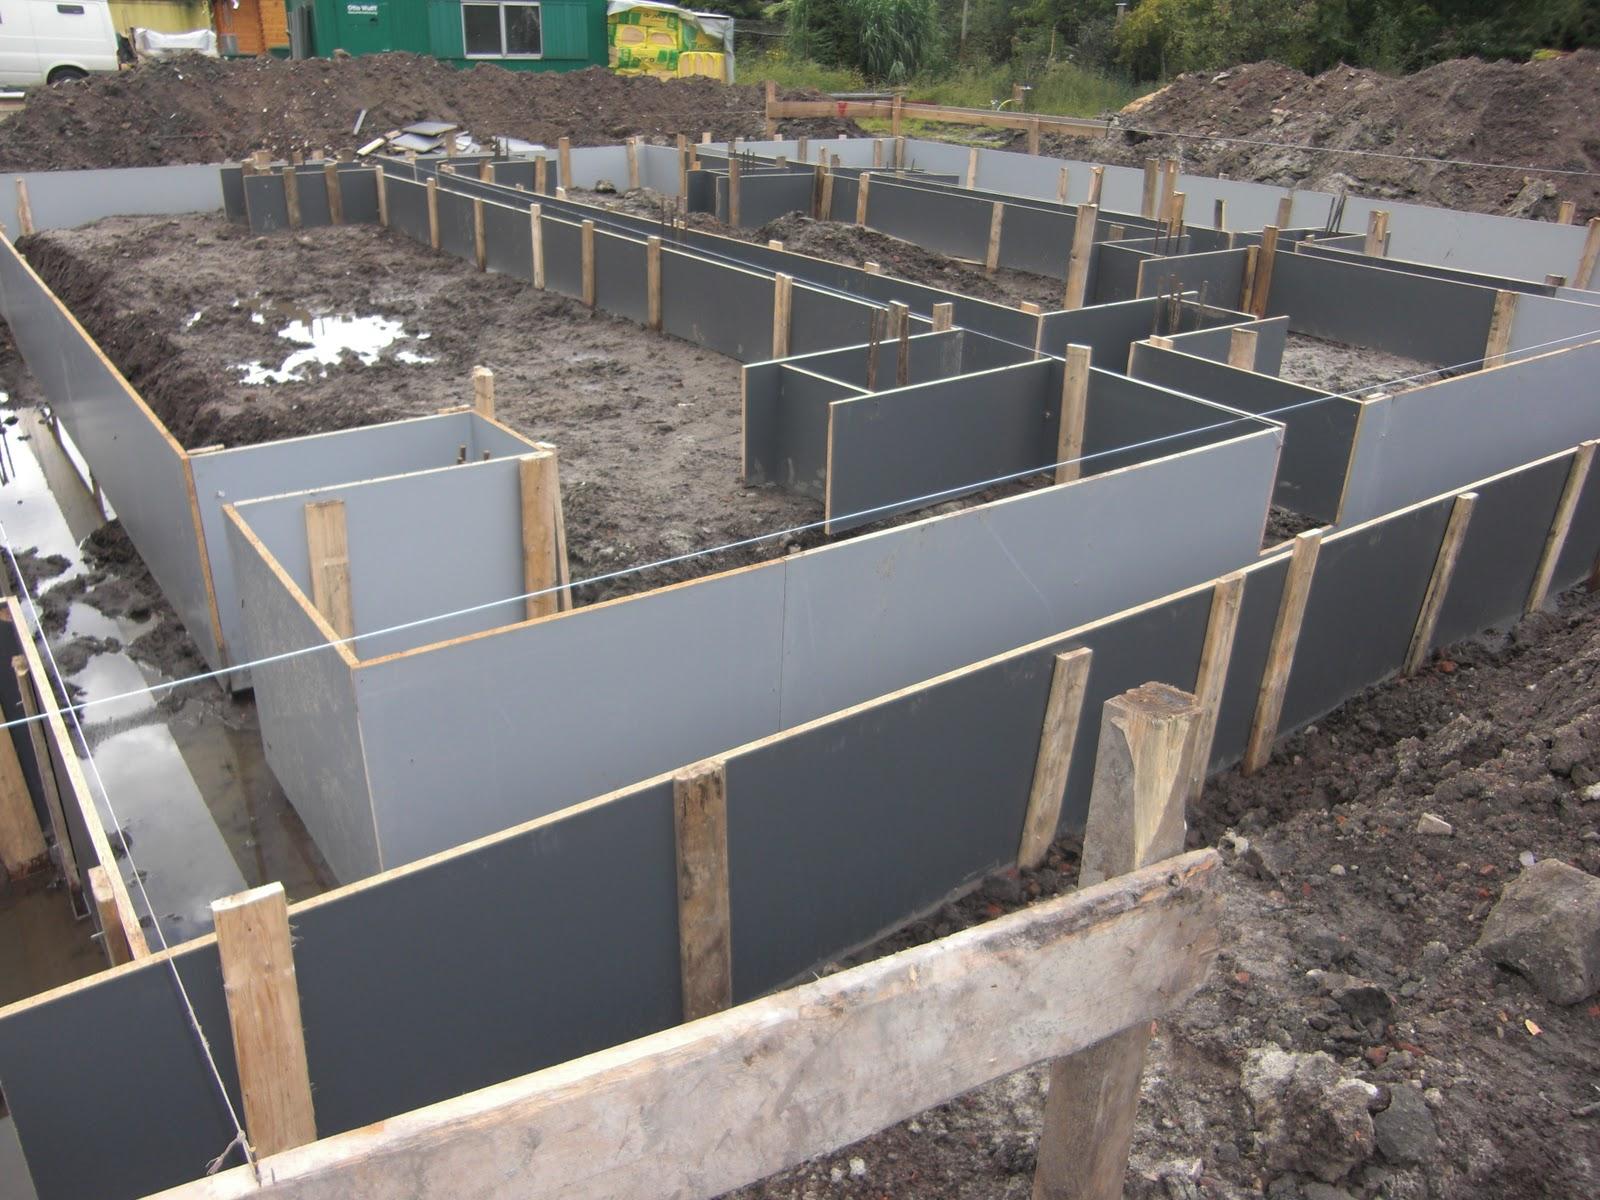 friesenhaus ochsenwerder fundamentgr ben herstellen. Black Bedroom Furniture Sets. Home Design Ideas